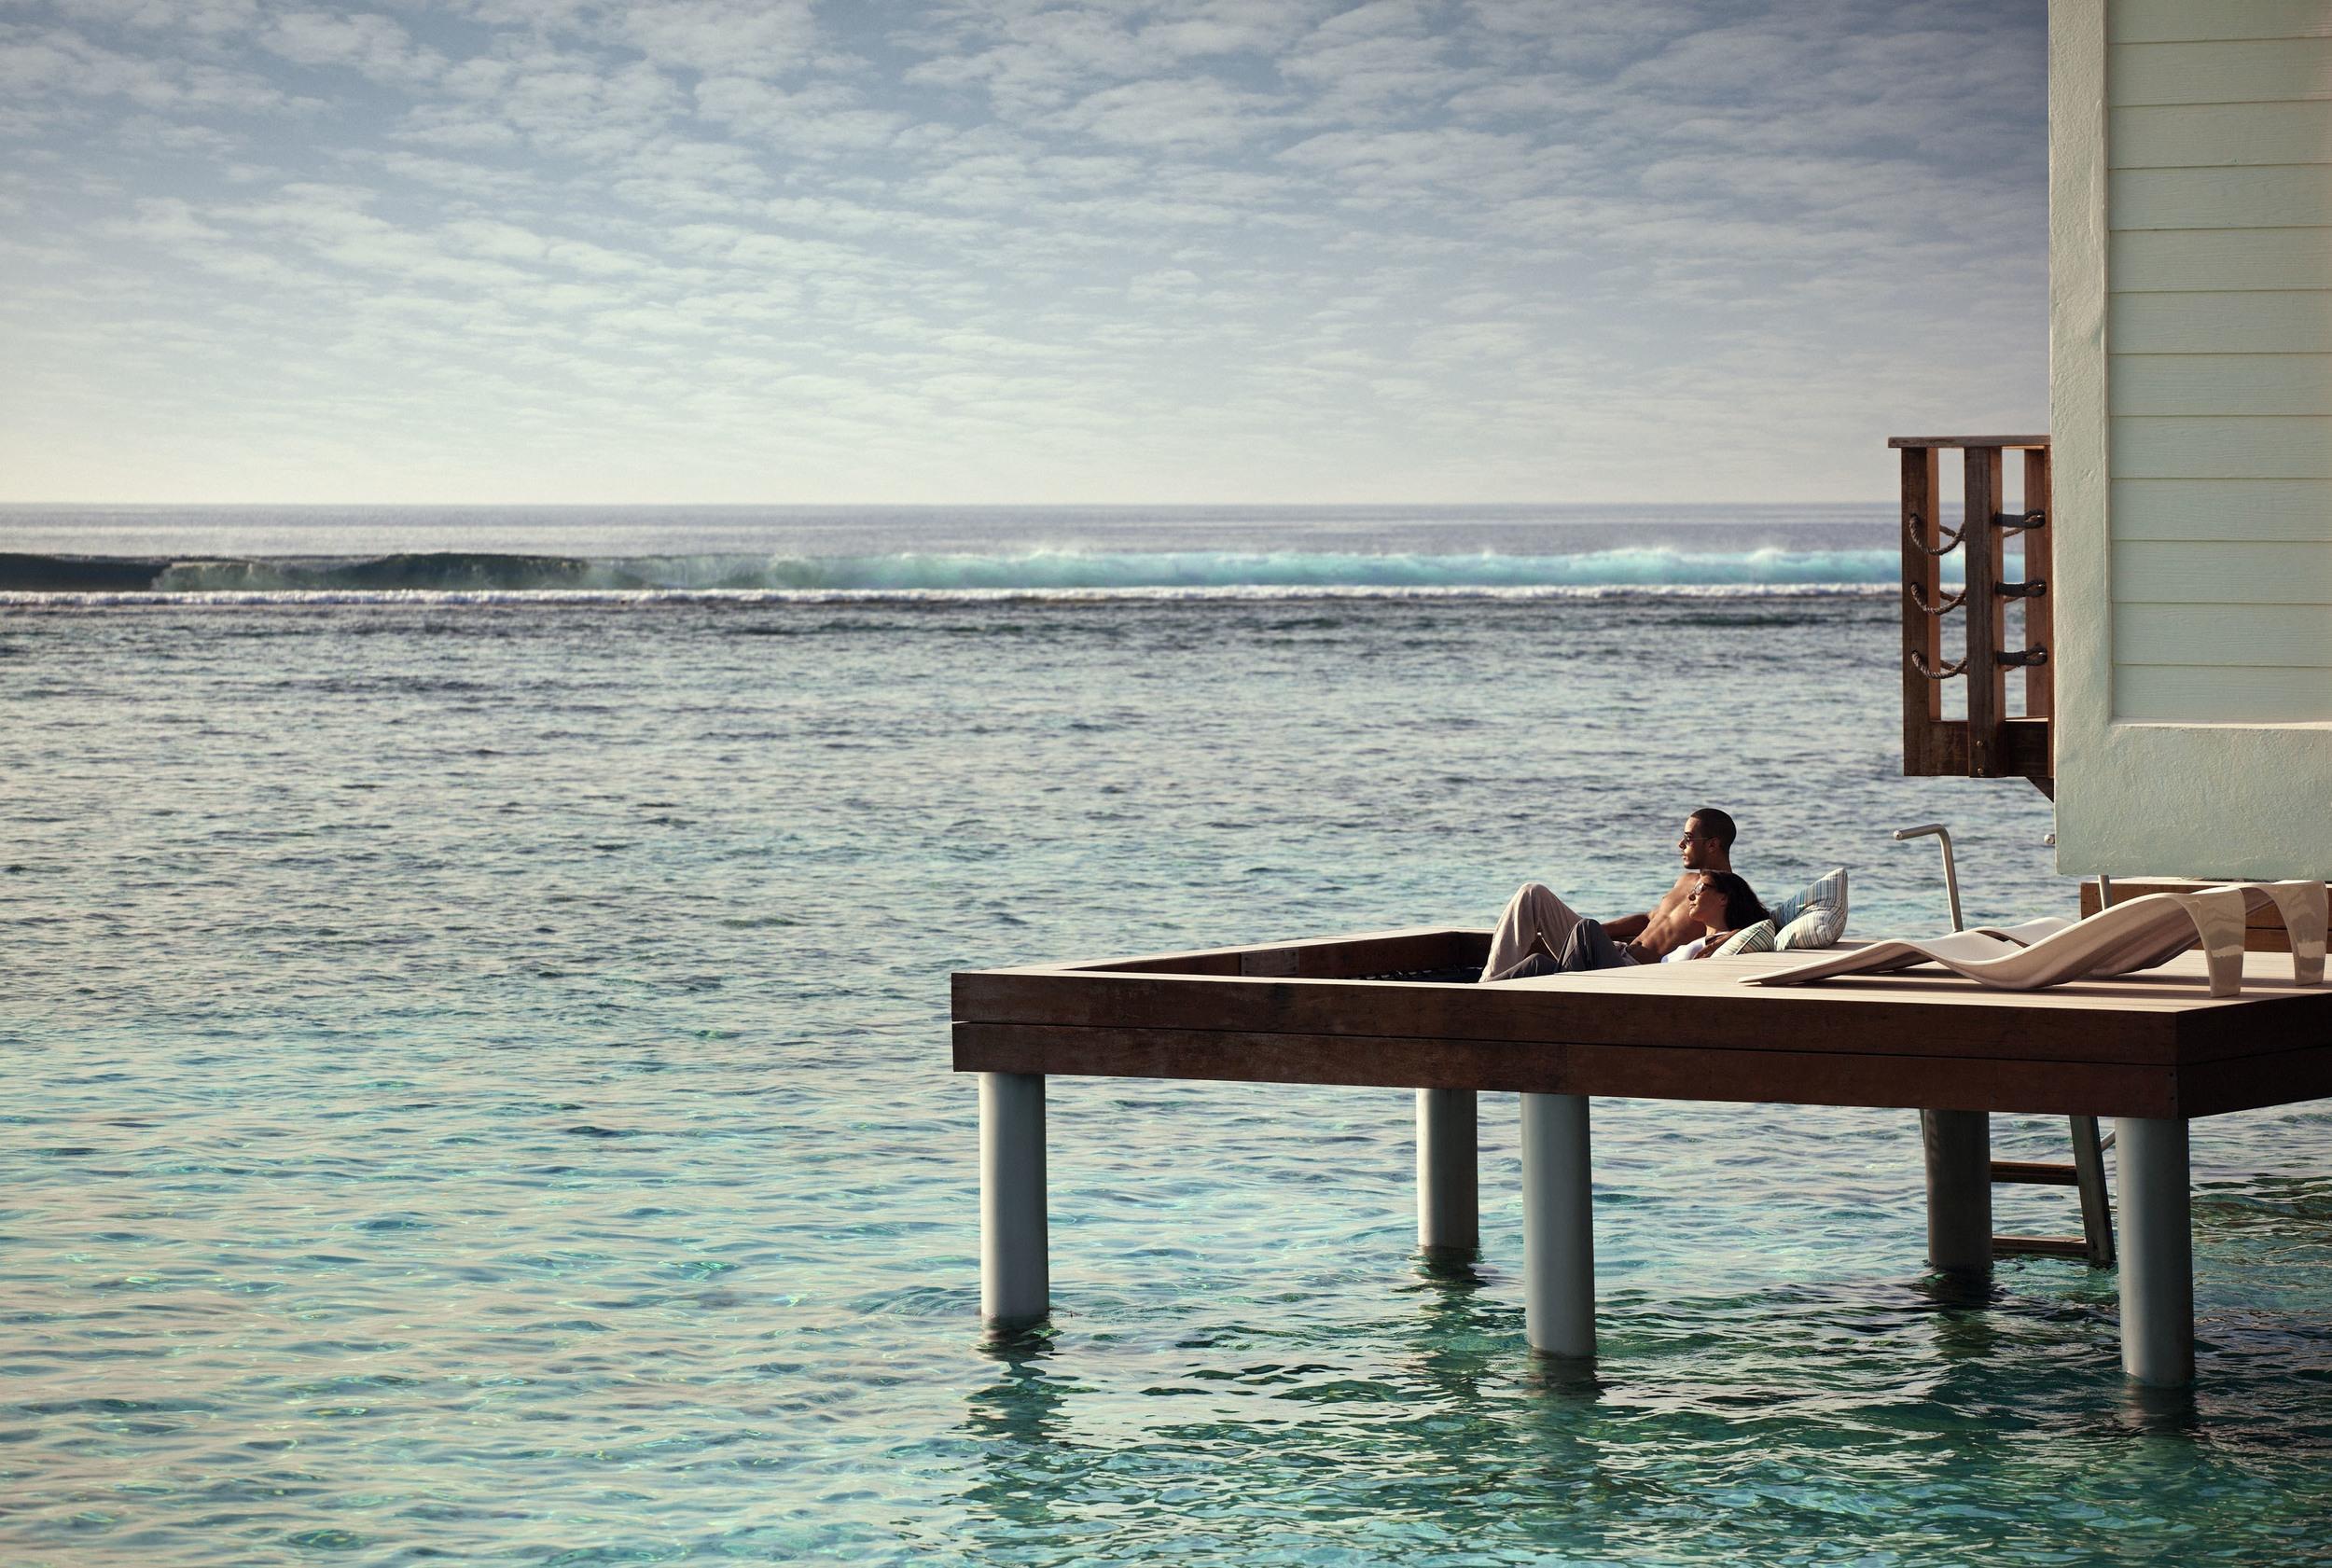 Private Sun Deck atHoliday Inn Resort Kandooma Maldives | Photo Credit: InterContinental Hotels Group